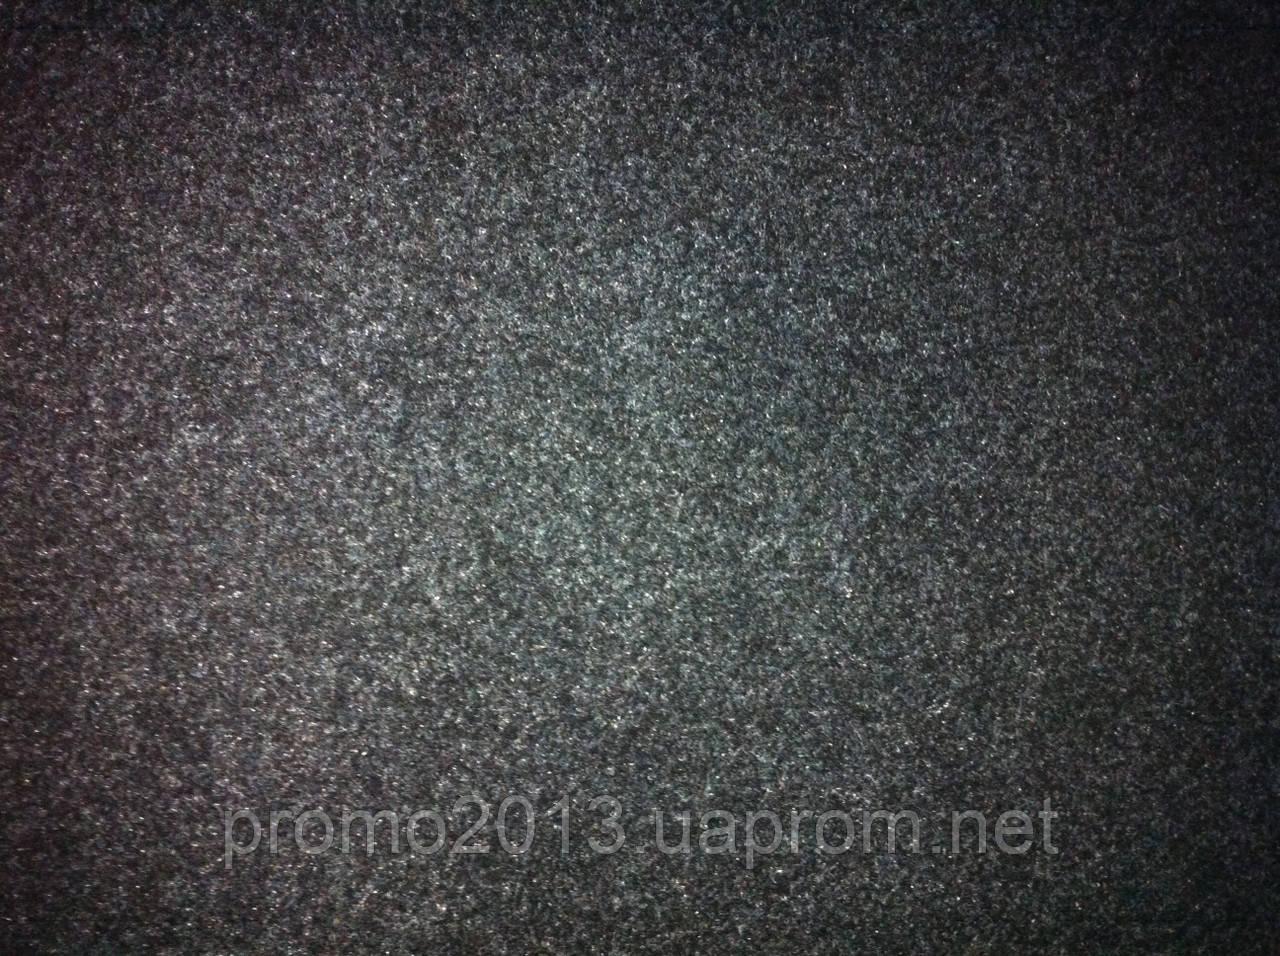 "Автокарпет пр-ва Италия ш.155см  серый, чёрный  беж. пл.450гр/м2 - ""Promo2013"" в Северодонецке"